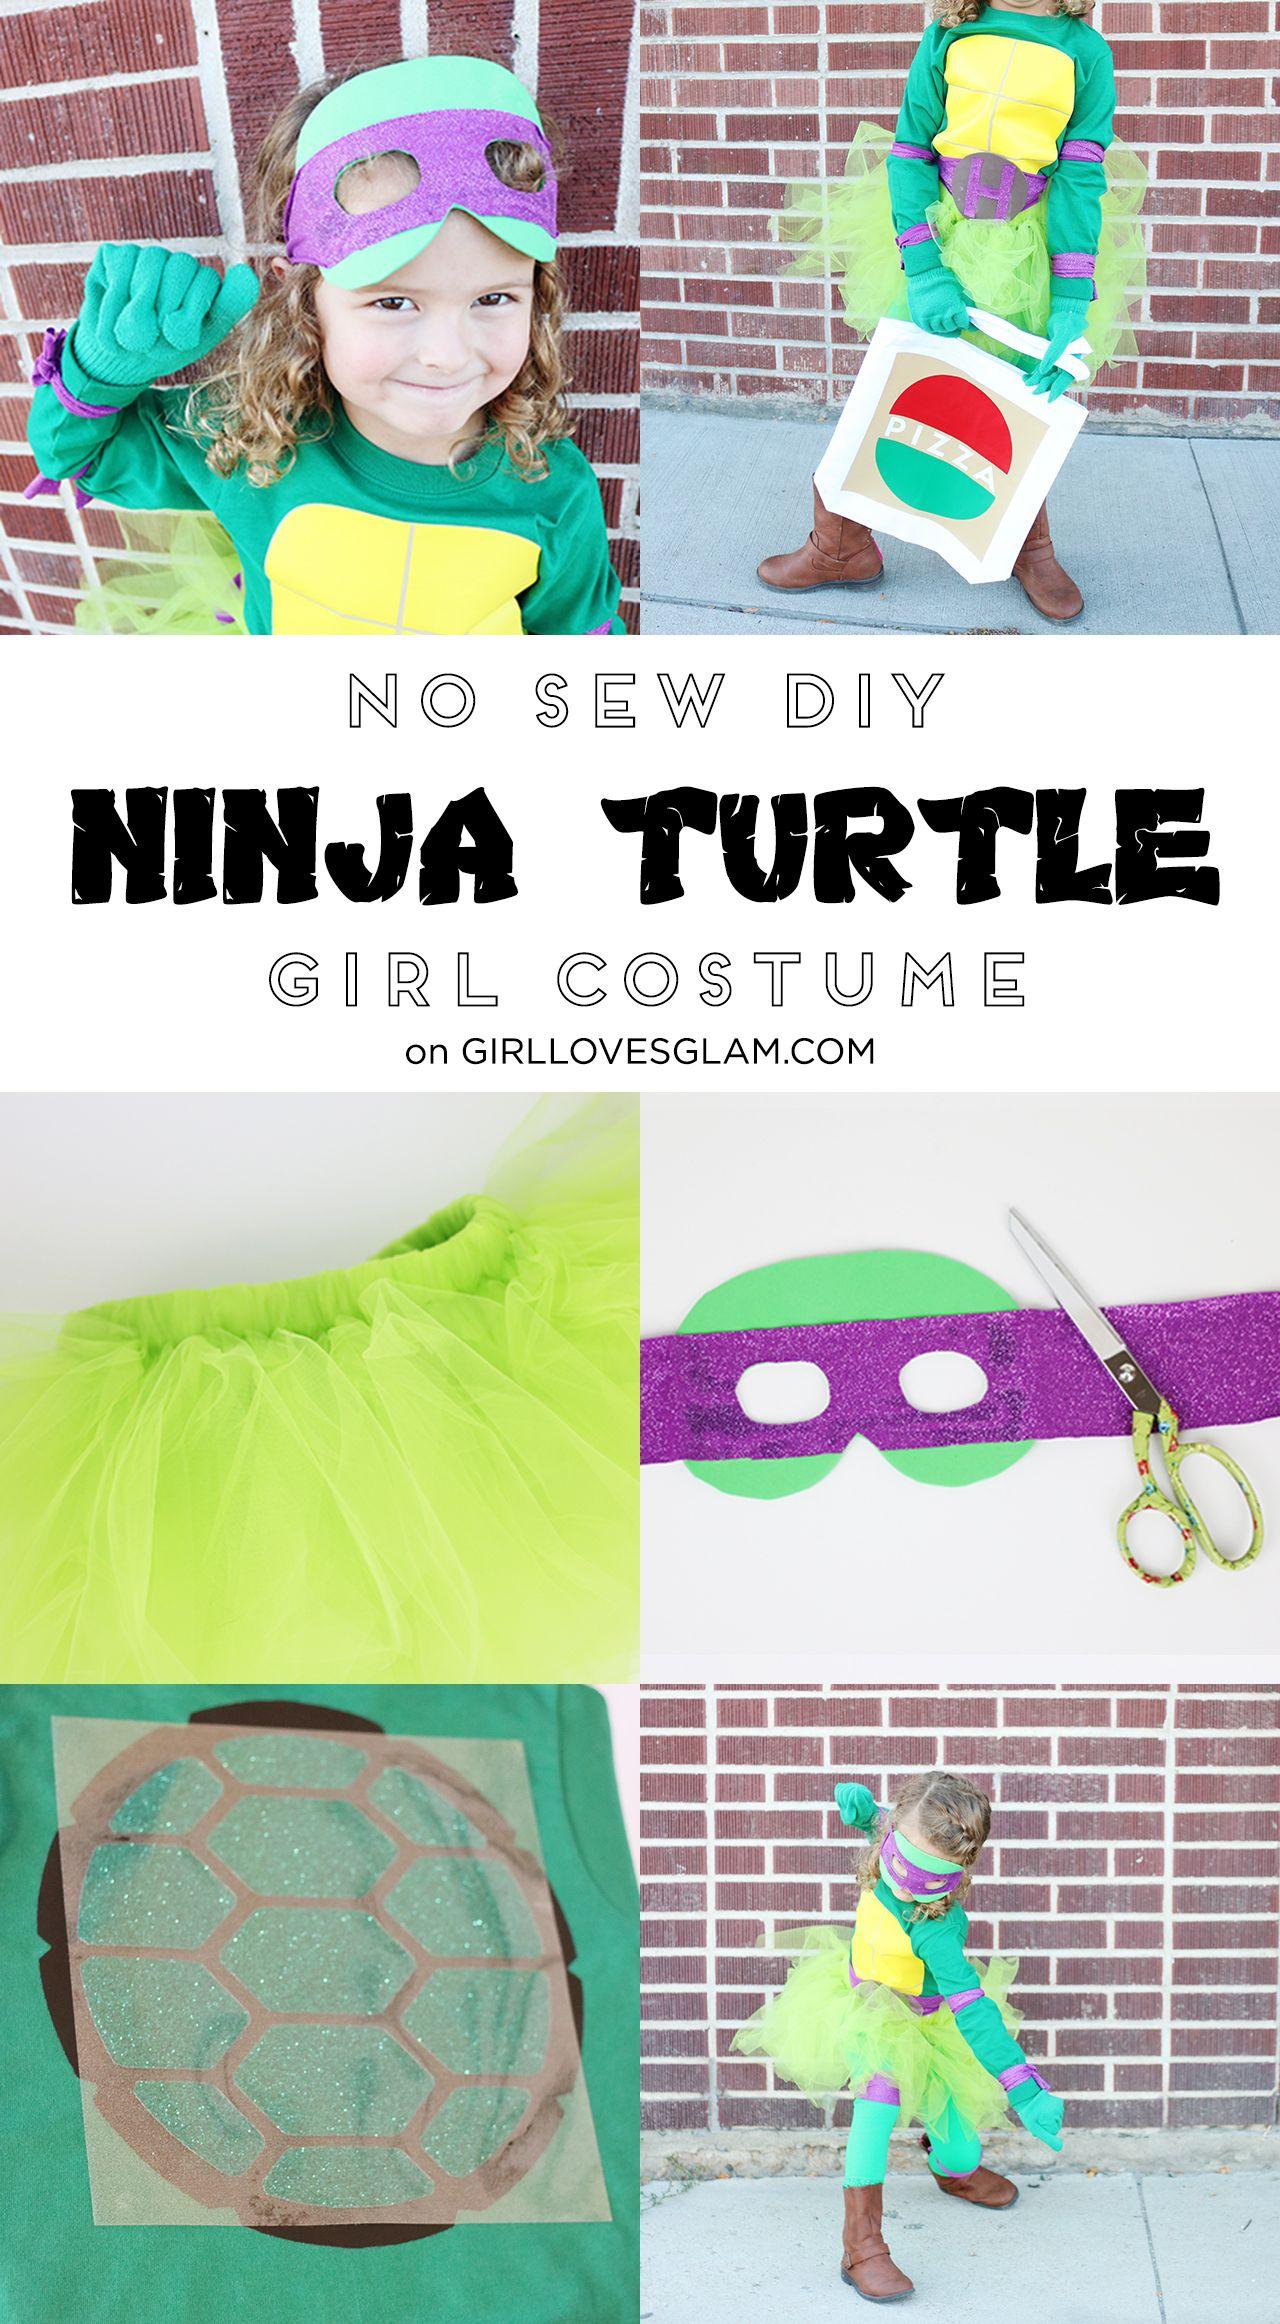 Diy no sew ninja turtle costume for girls holidays best diy no sew girl ninja turtle costume for halloween solutioingenieria Image collections